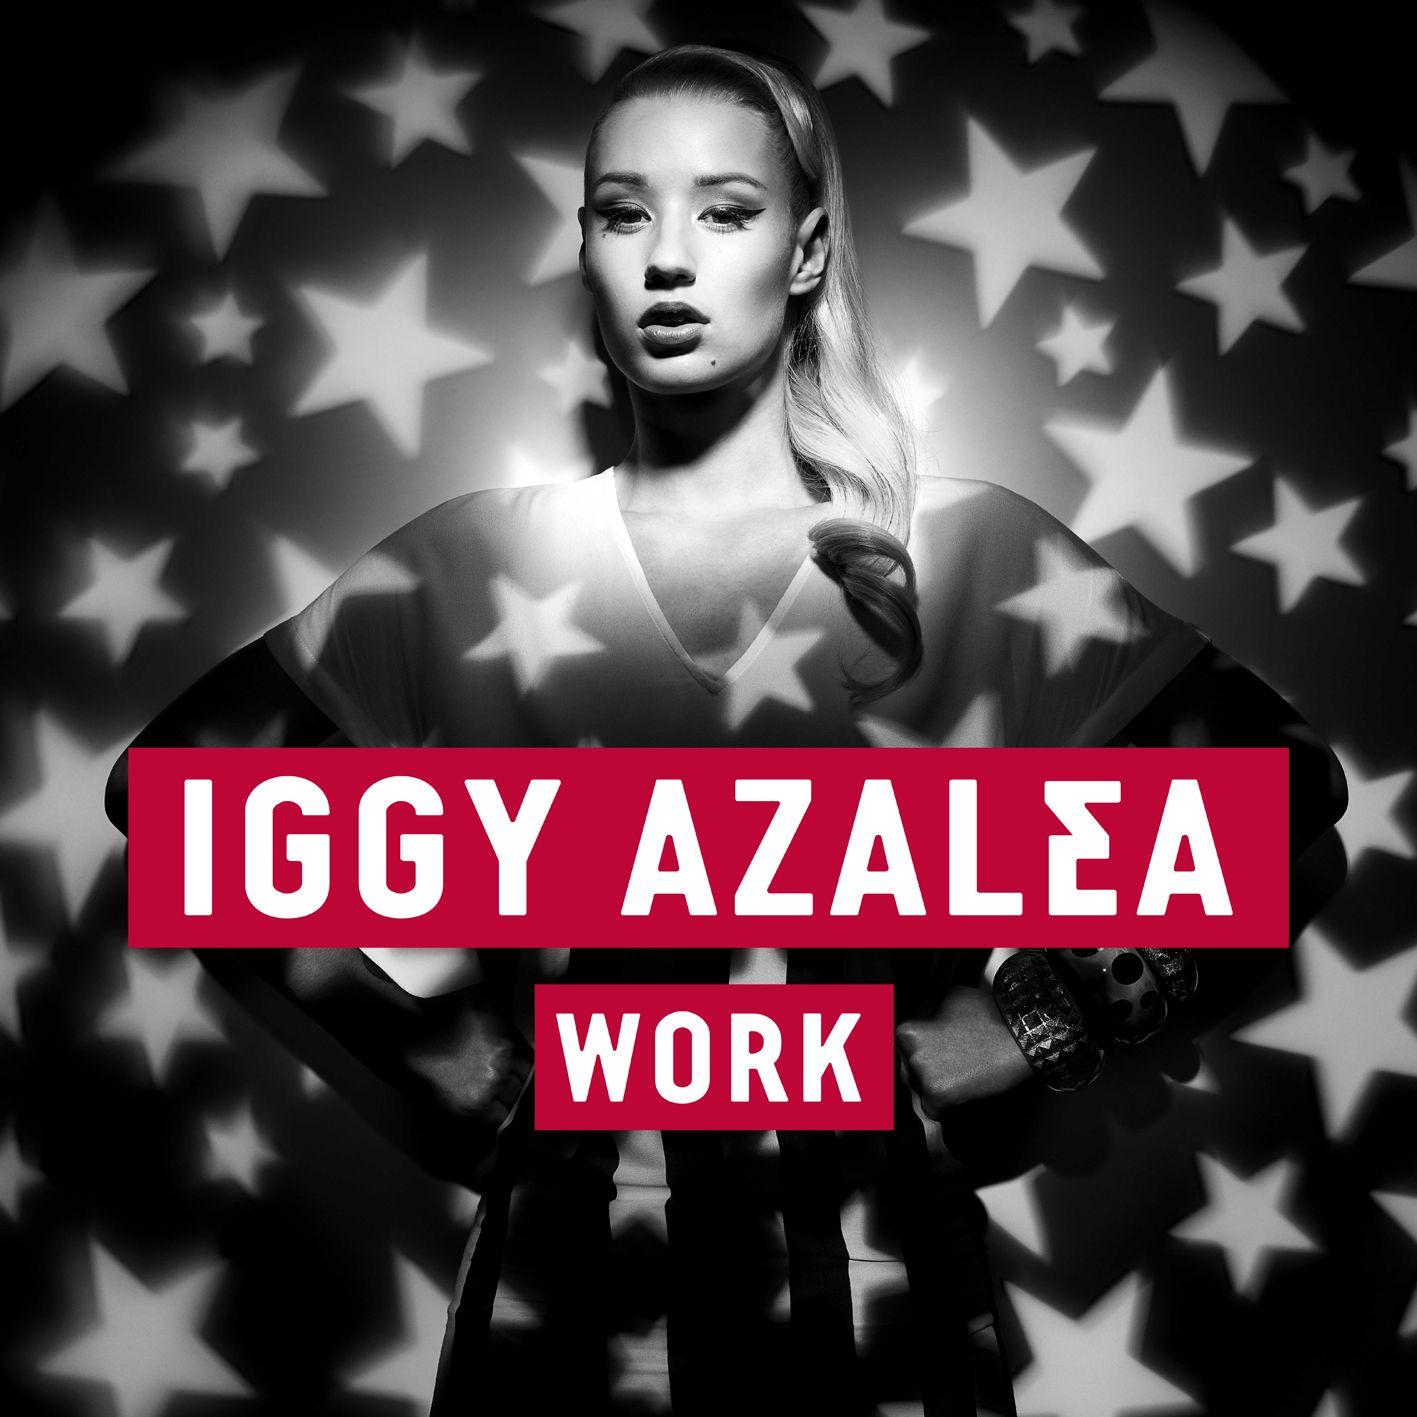 Iggy Azalea Work Http Drawmeasong Com Blog Iggy Azalea Iggy Azaleas